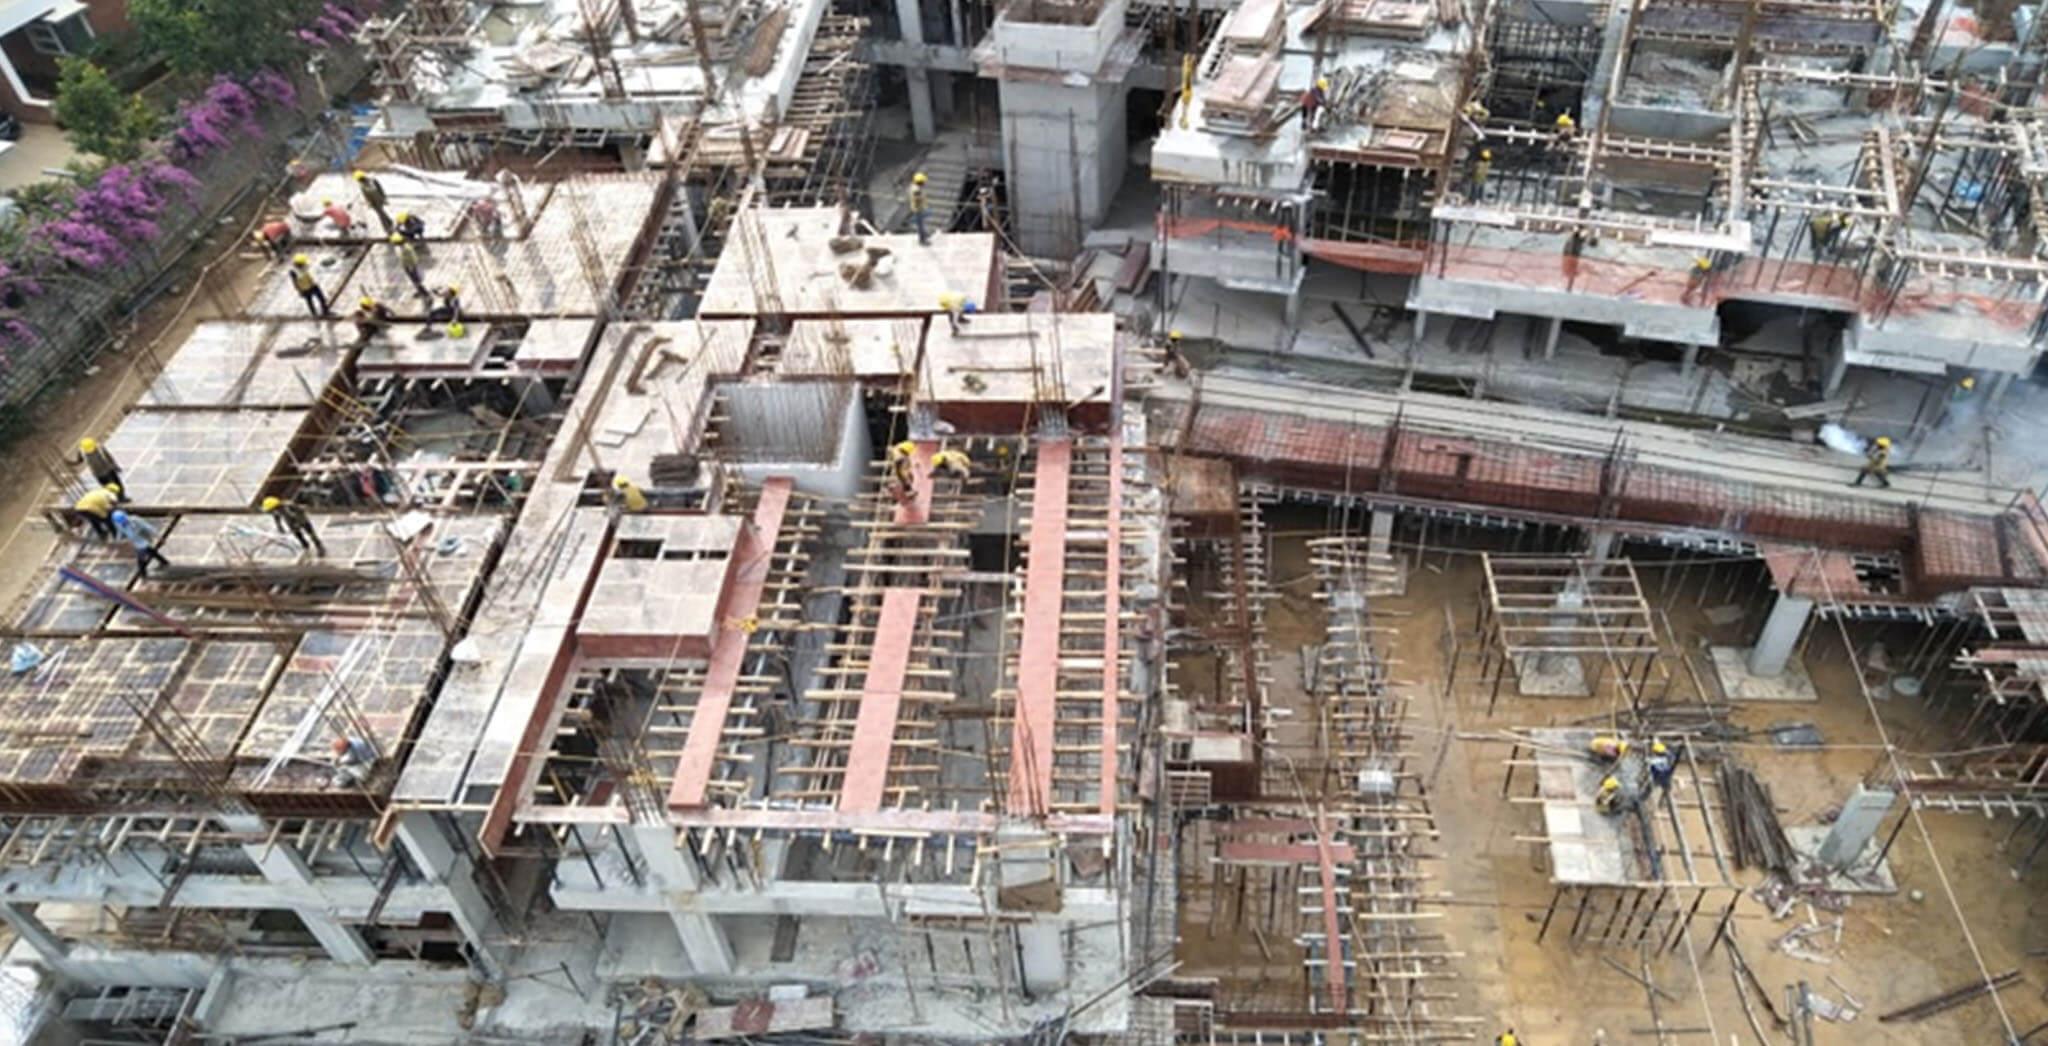 Oct 2019 - K, L & M Blocks: First floor slab completed; L Block: Second floor slab completed; K and M Blocks: Second floor work-in-progress